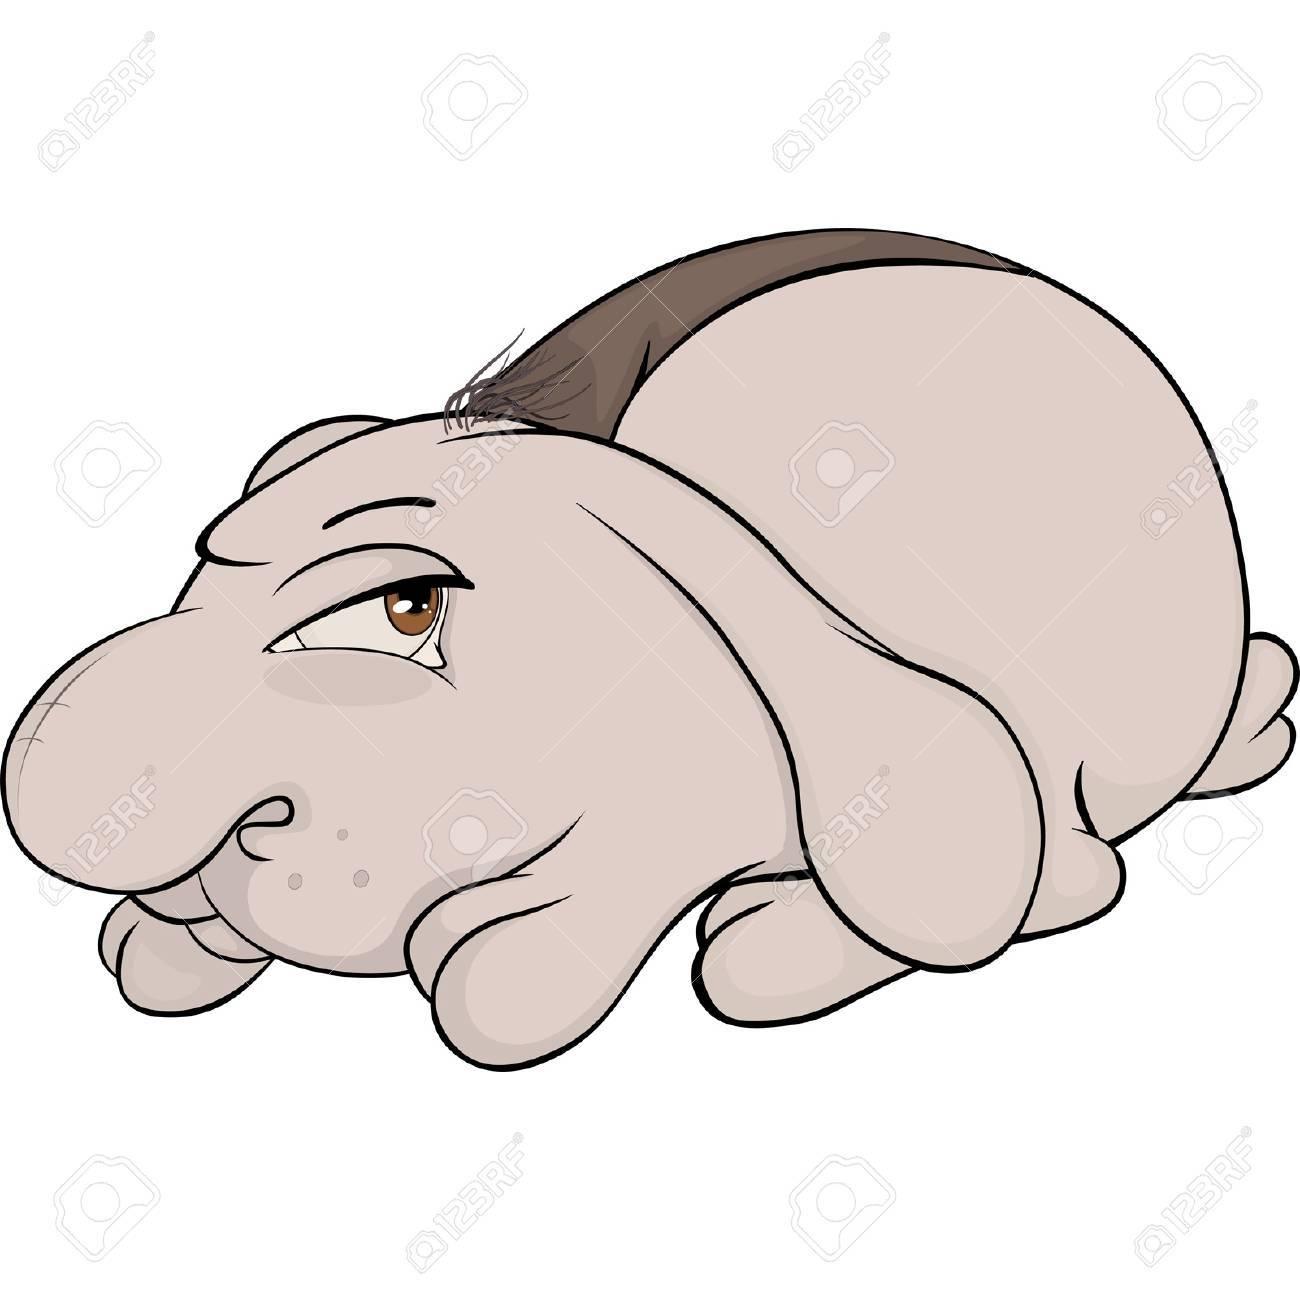 Rabbit.Cartoon Stock Vector - 11656559